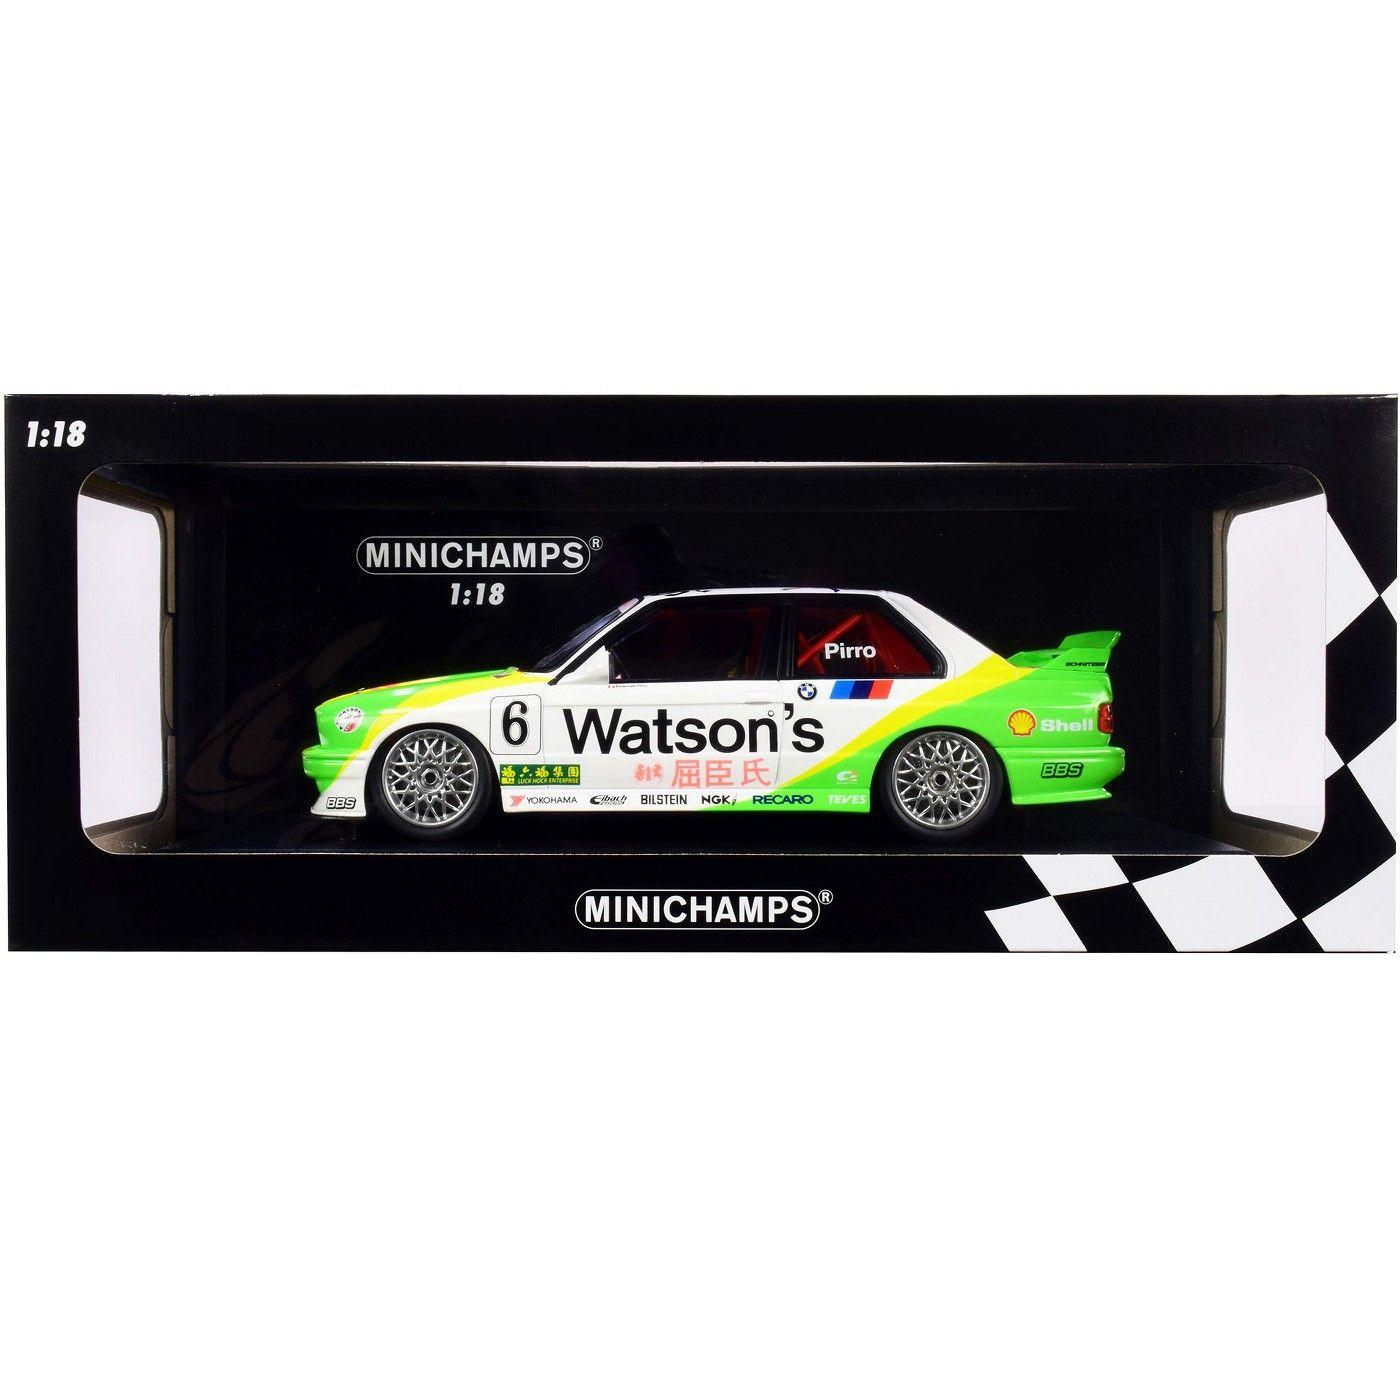 Bmw M3 6 Emanuele Pirro Bmw M Team Schnitzer Winner Macau Guia Race 1991 Limited Edition To 300 Pieces 1 18 Diecast Model Car By Minichamps In 2021 Diecast Model Cars Car Model Bmw M3 [ 1400 x 1400 Pixel ]